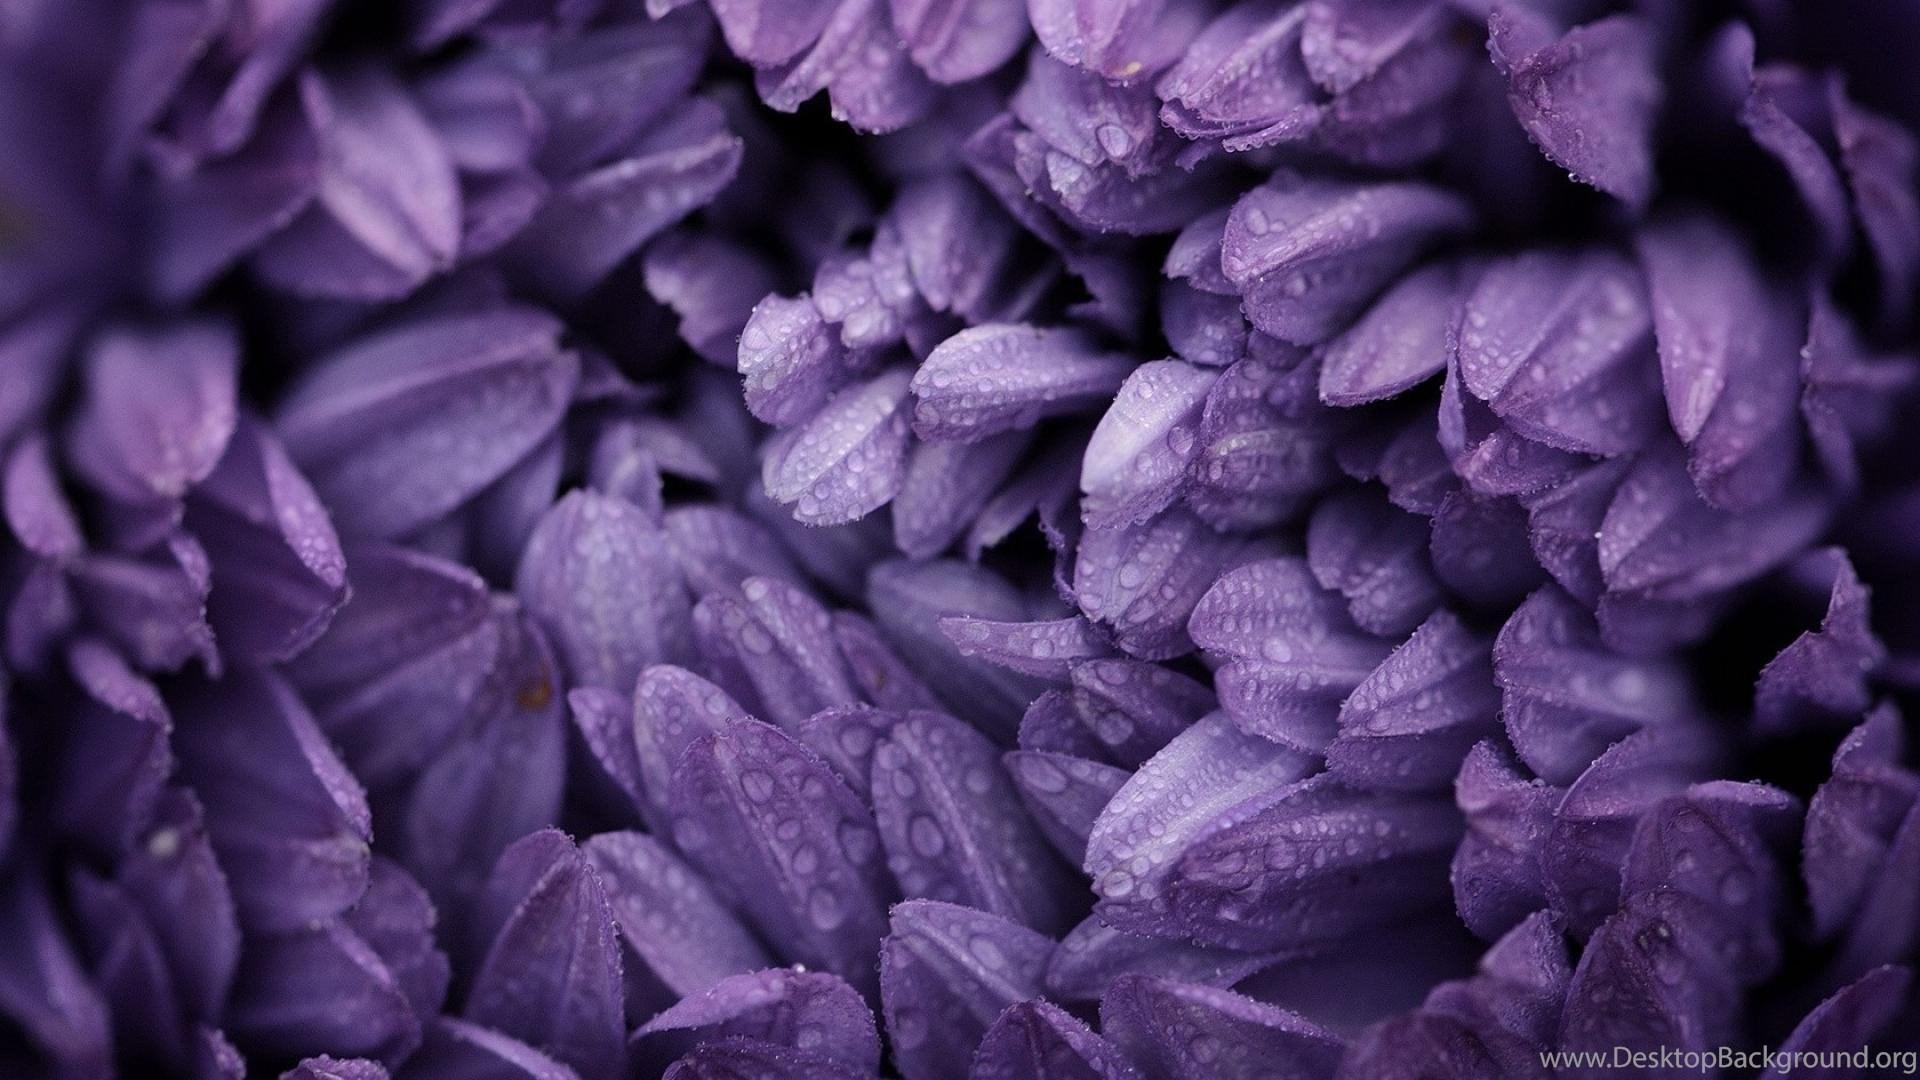 Nature Flowers Violet Purple Flower Petals Wallpapers Desktop Background